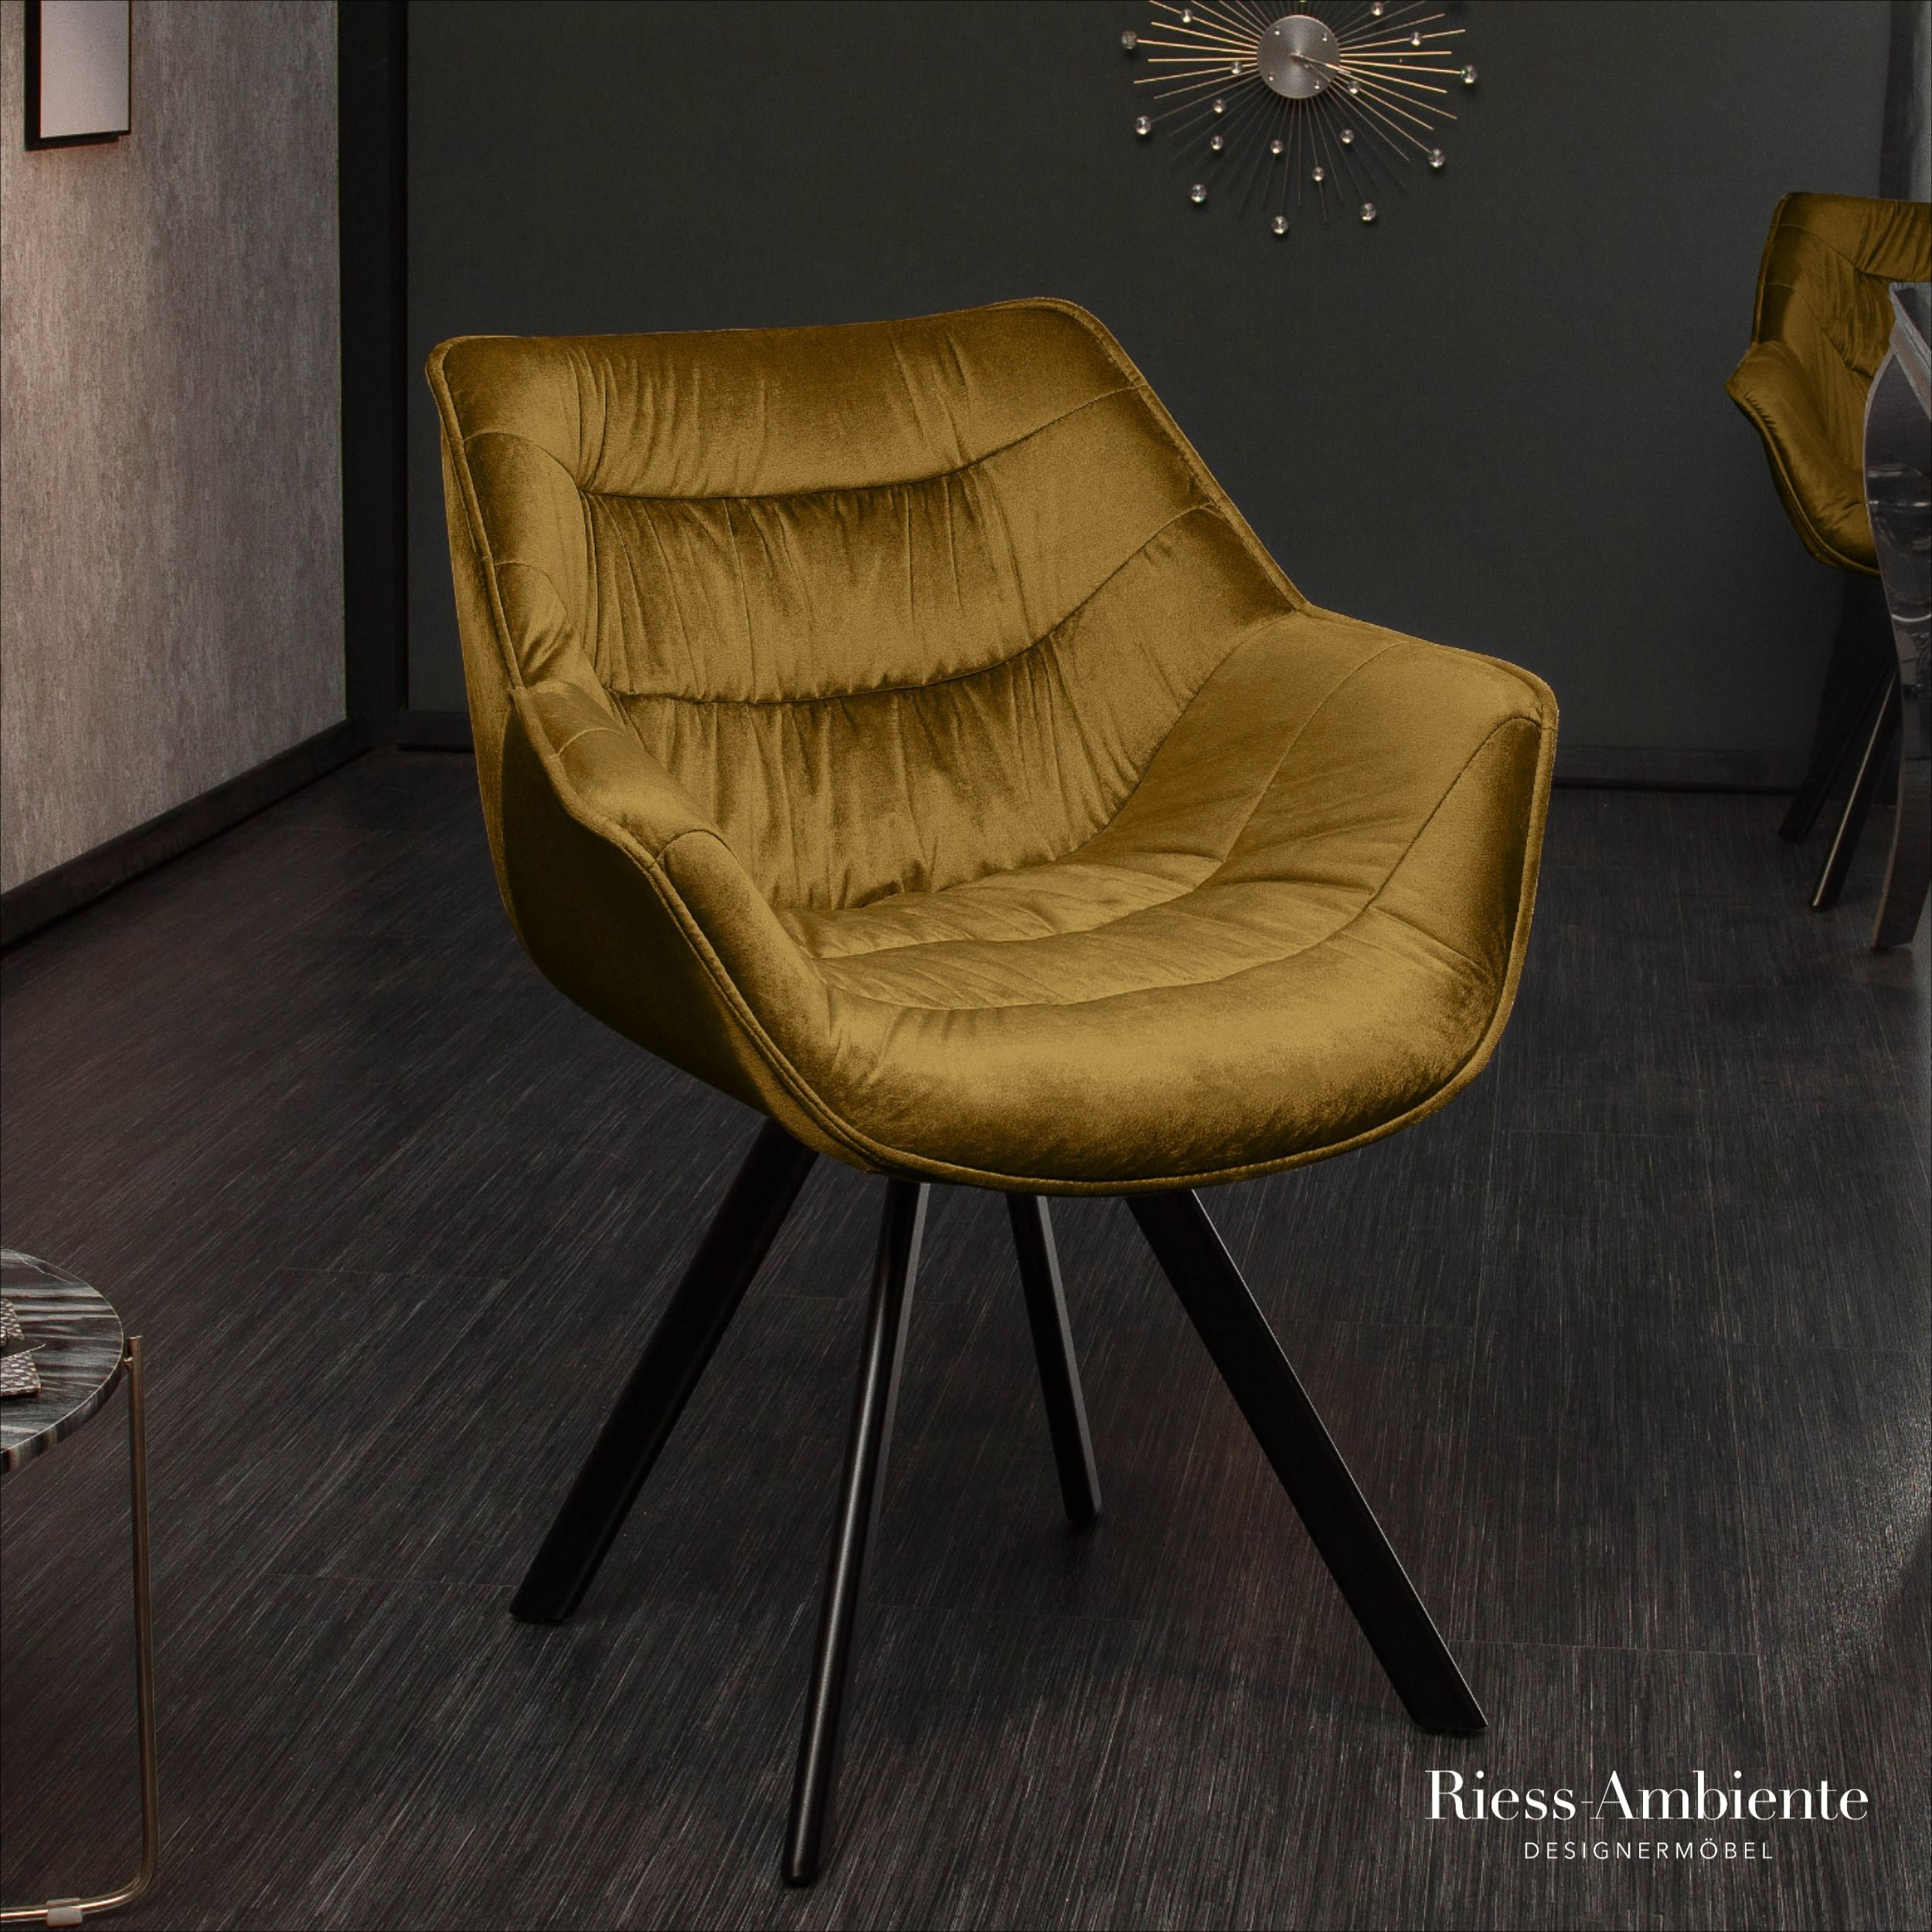 48+ Samt stuhl schwarz gold ideen